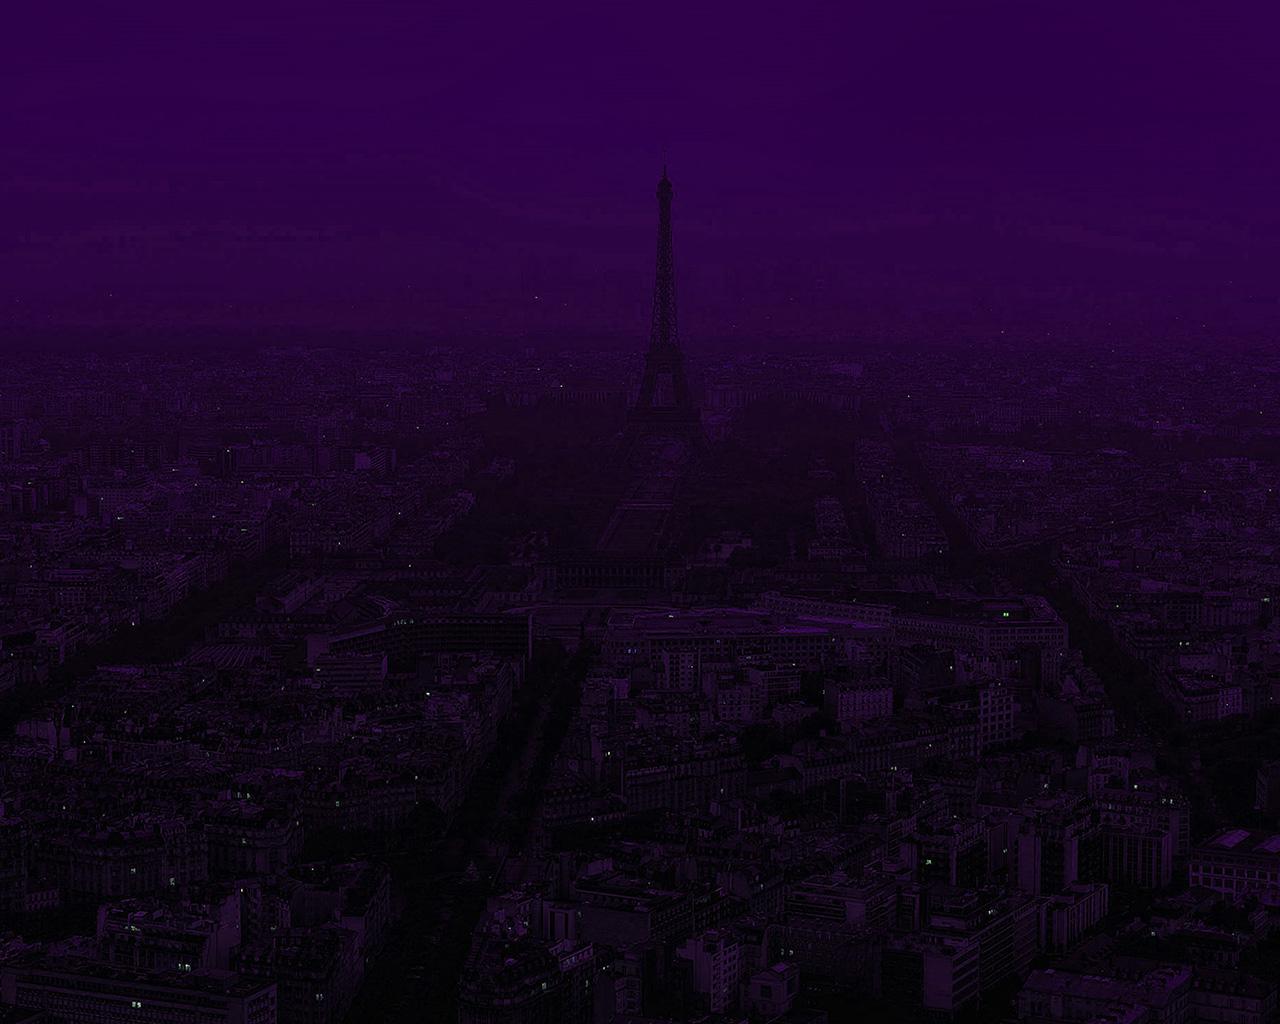 wallpaper for desktop, laptop | bb43-paris-dark-purple ...